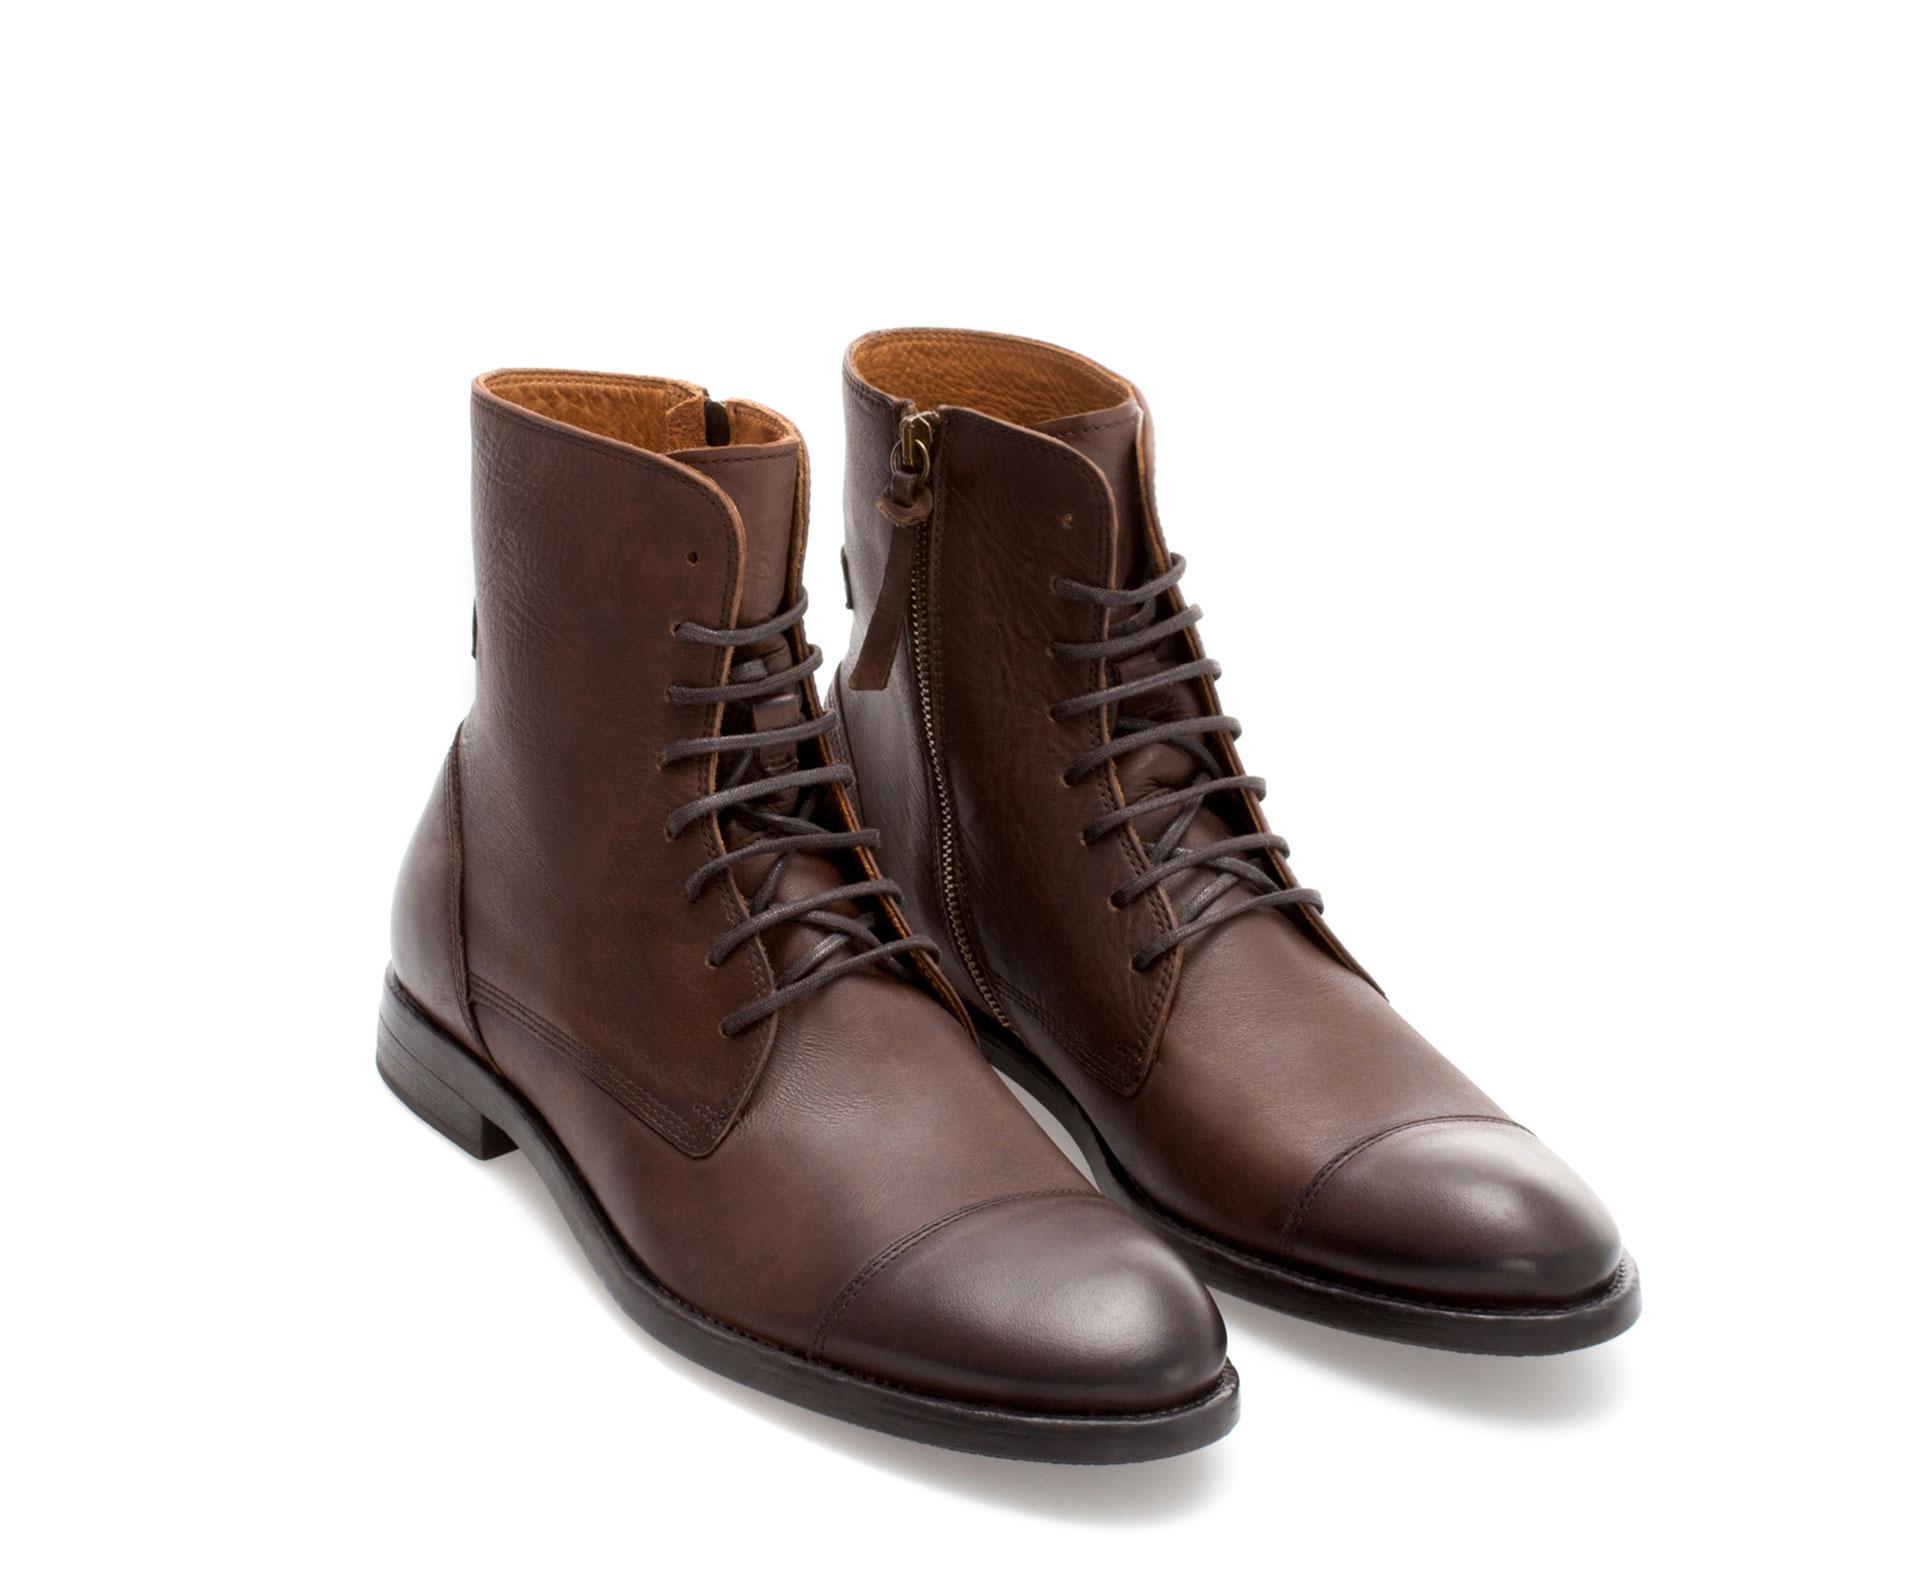 zara leather captoe boot in brown for men lyst. Black Bedroom Furniture Sets. Home Design Ideas